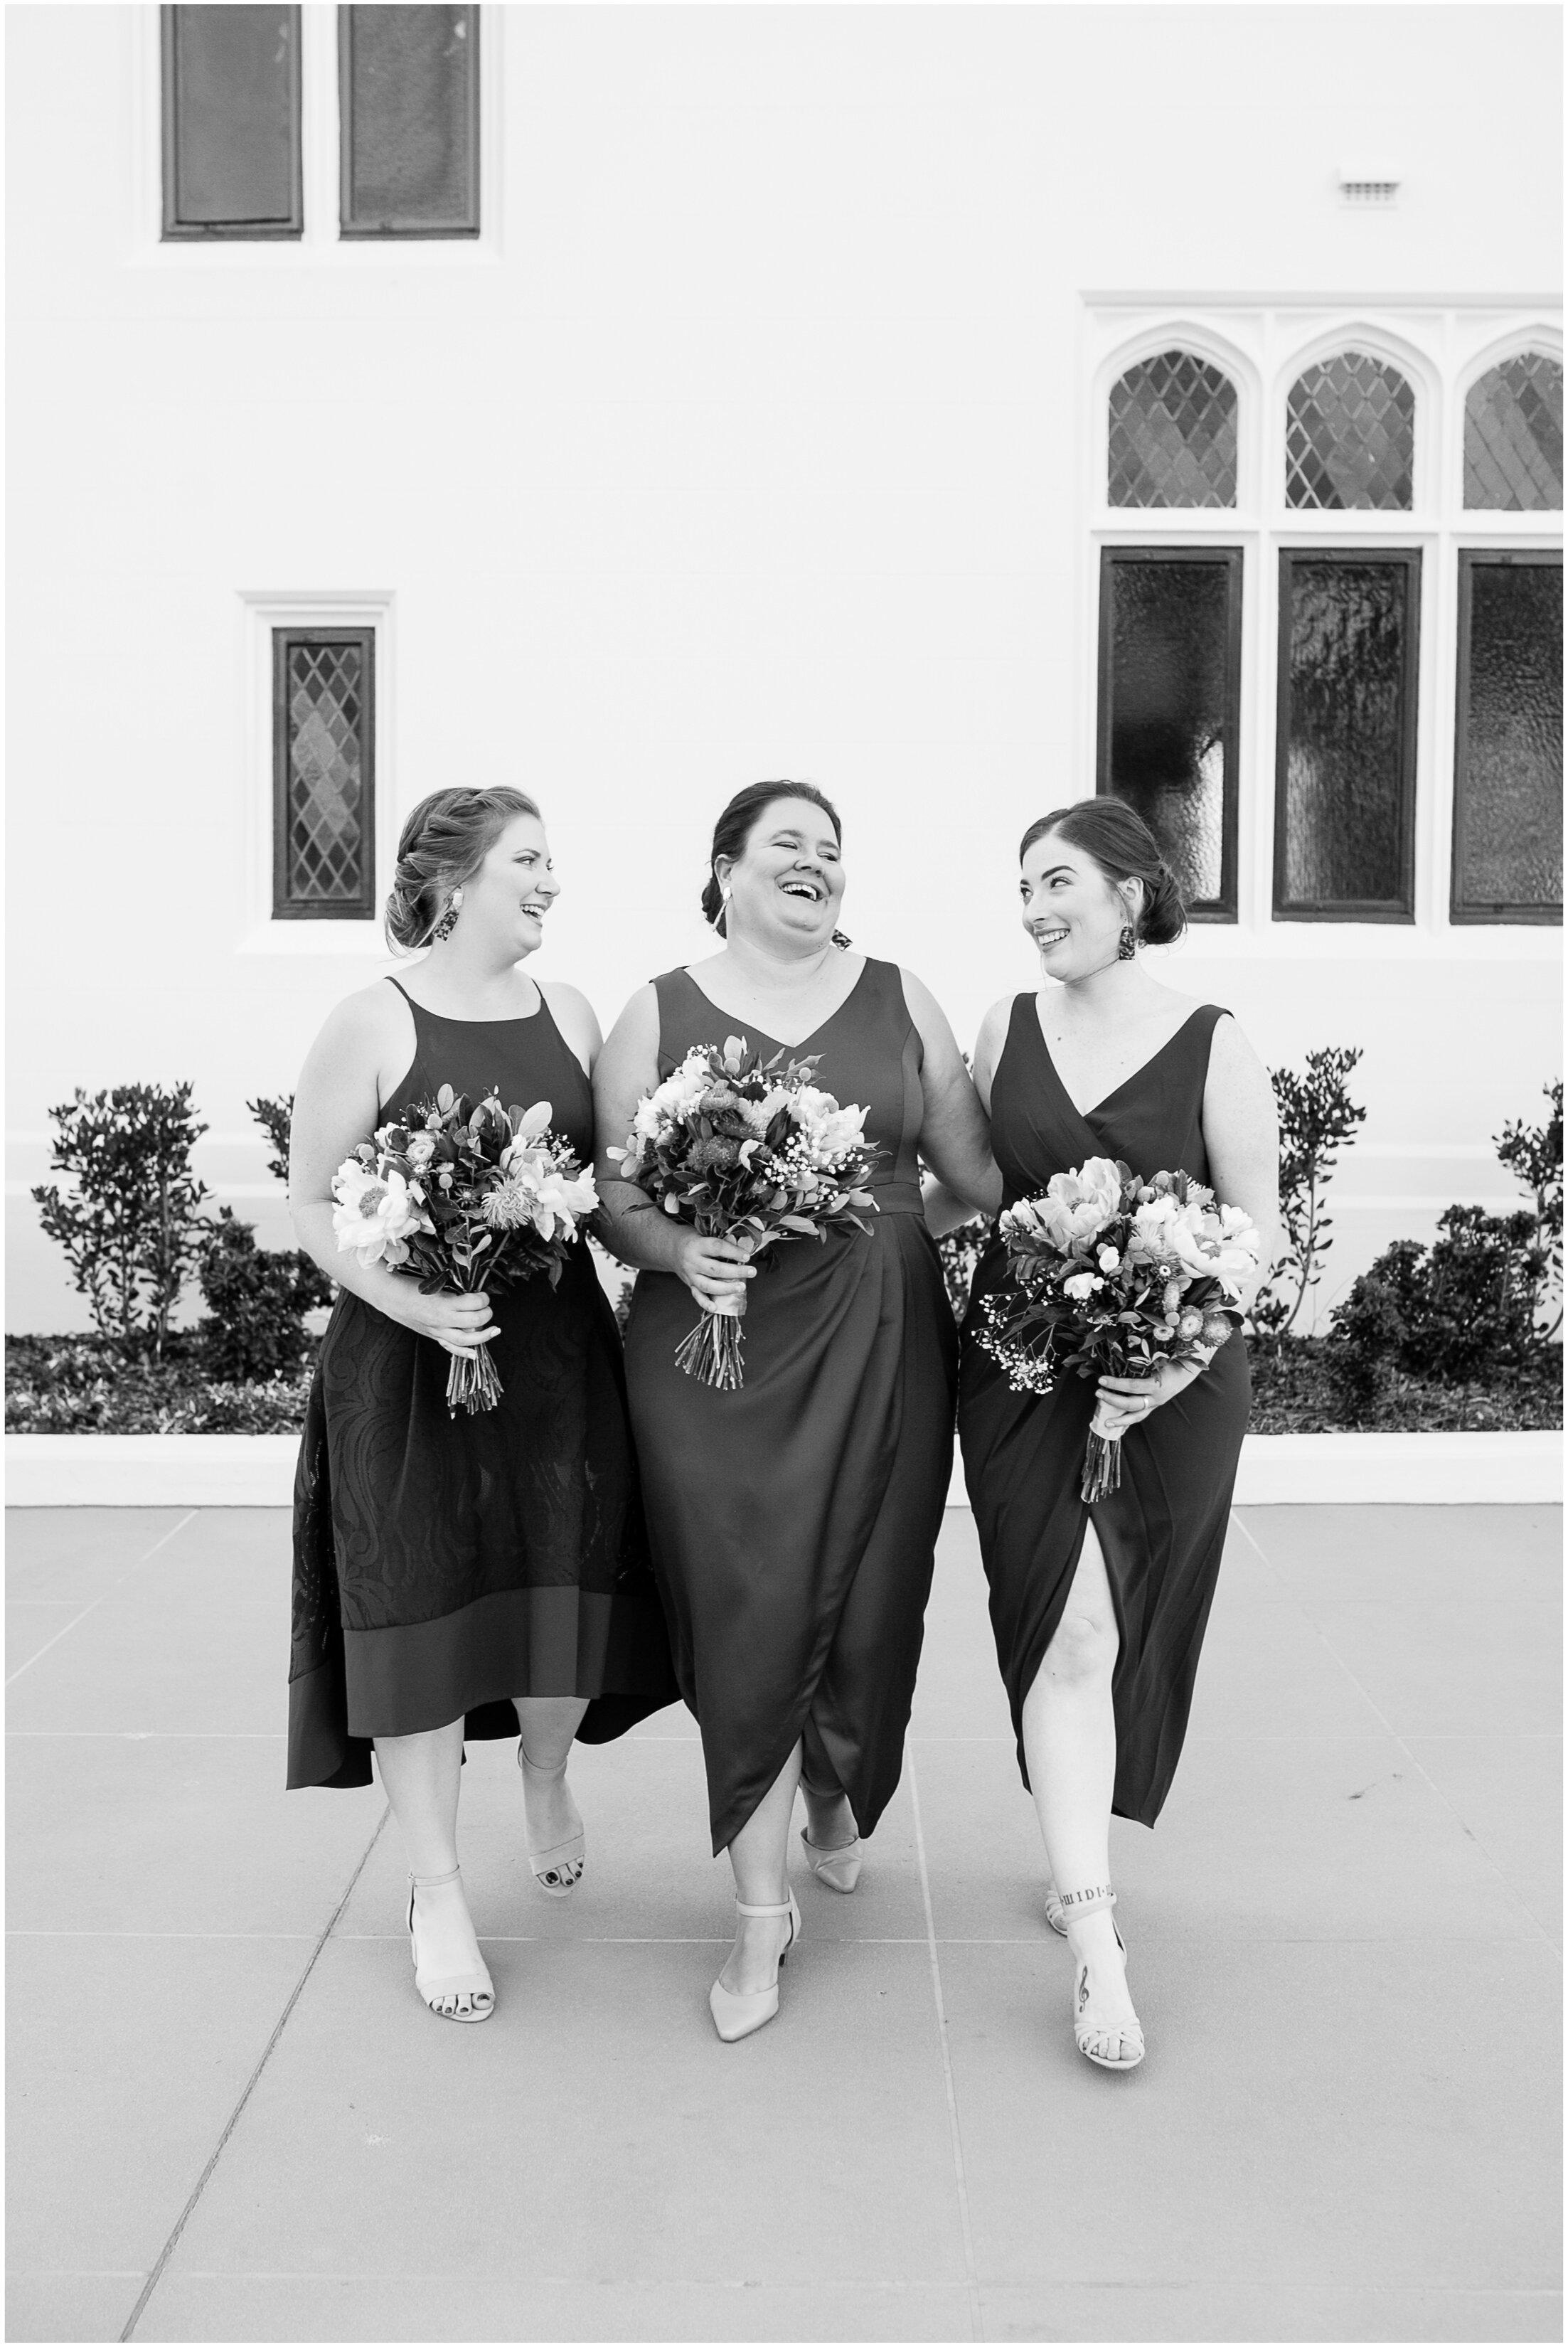 refinery-brisbane-wedding-photography-film-photographer-fine-art-41.jpg